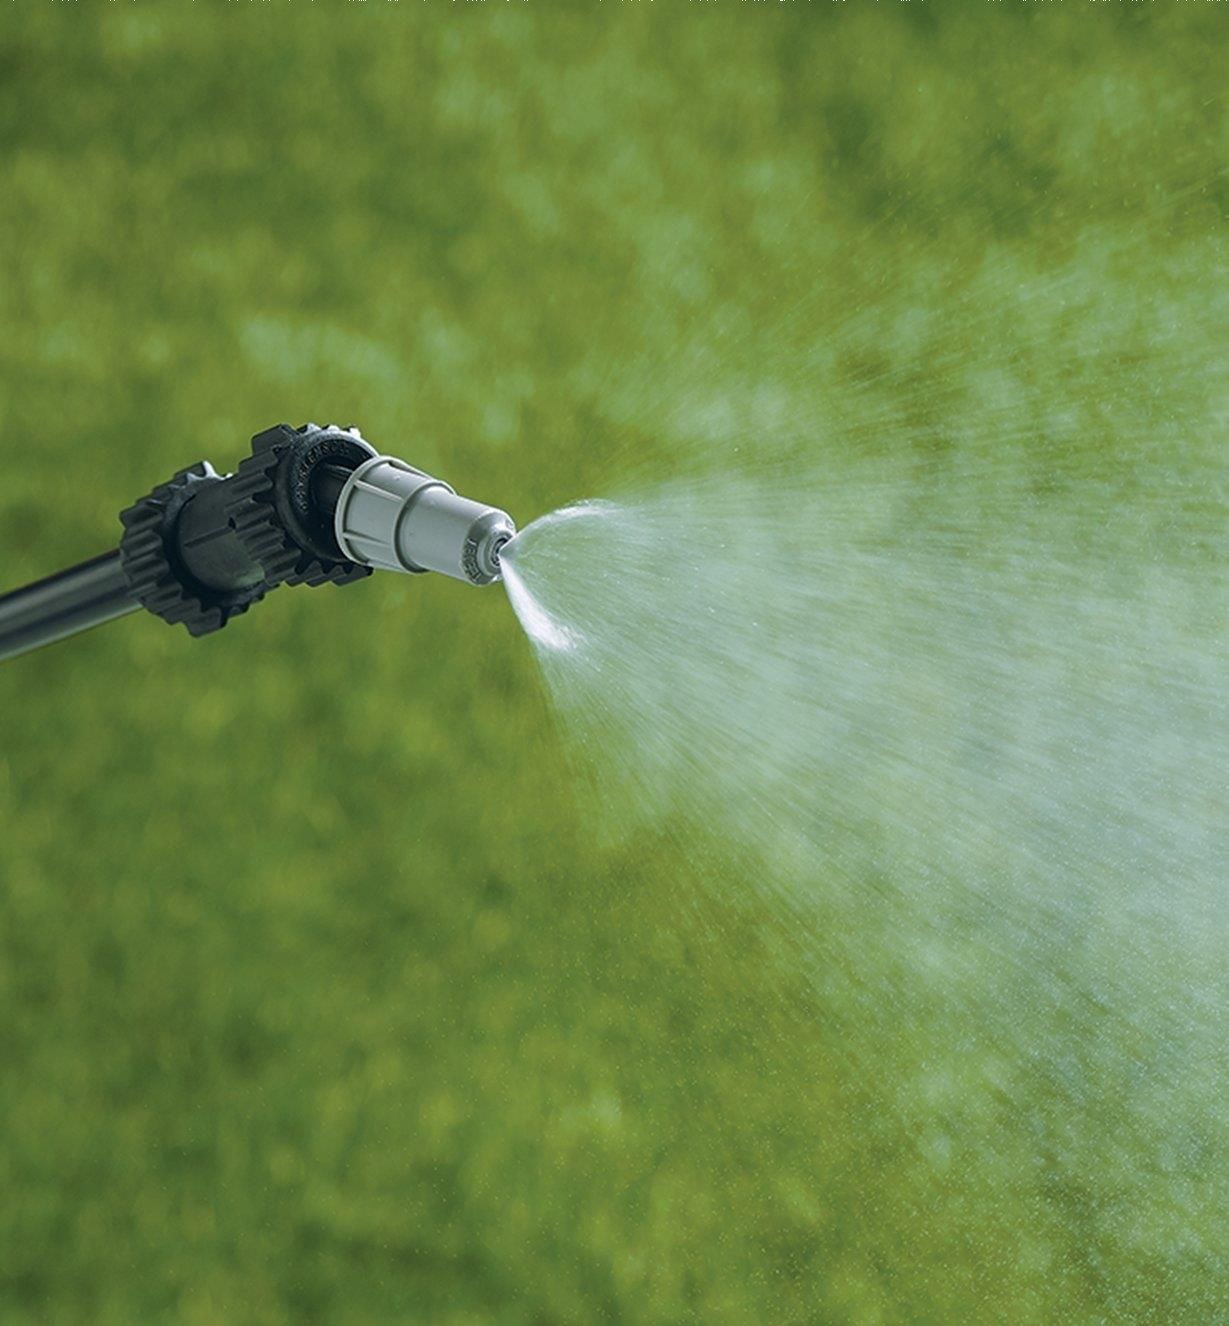 Garden Sprayer wand using the mist setting